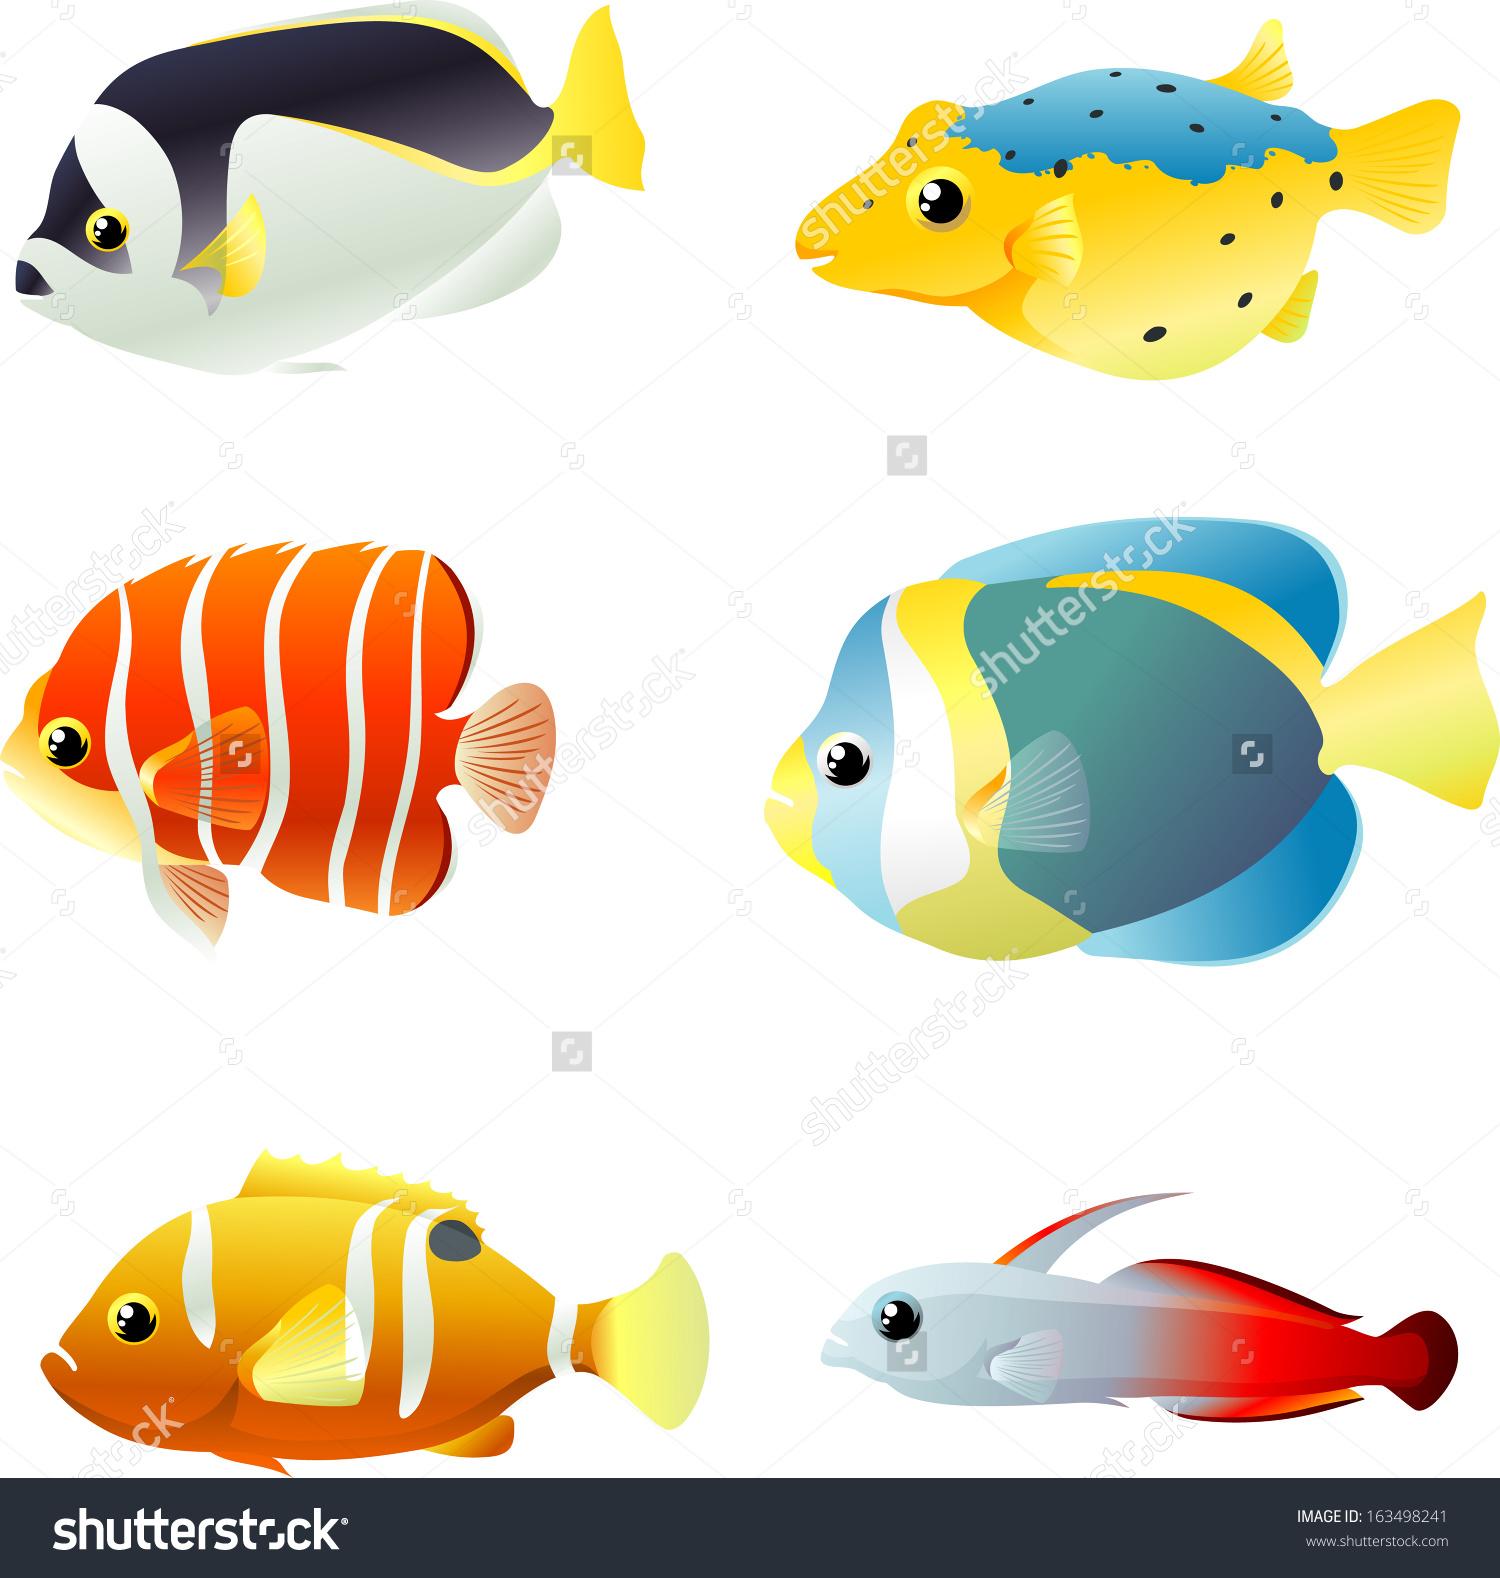 Marine Fish clipart Fish clipart #14 Download Marine